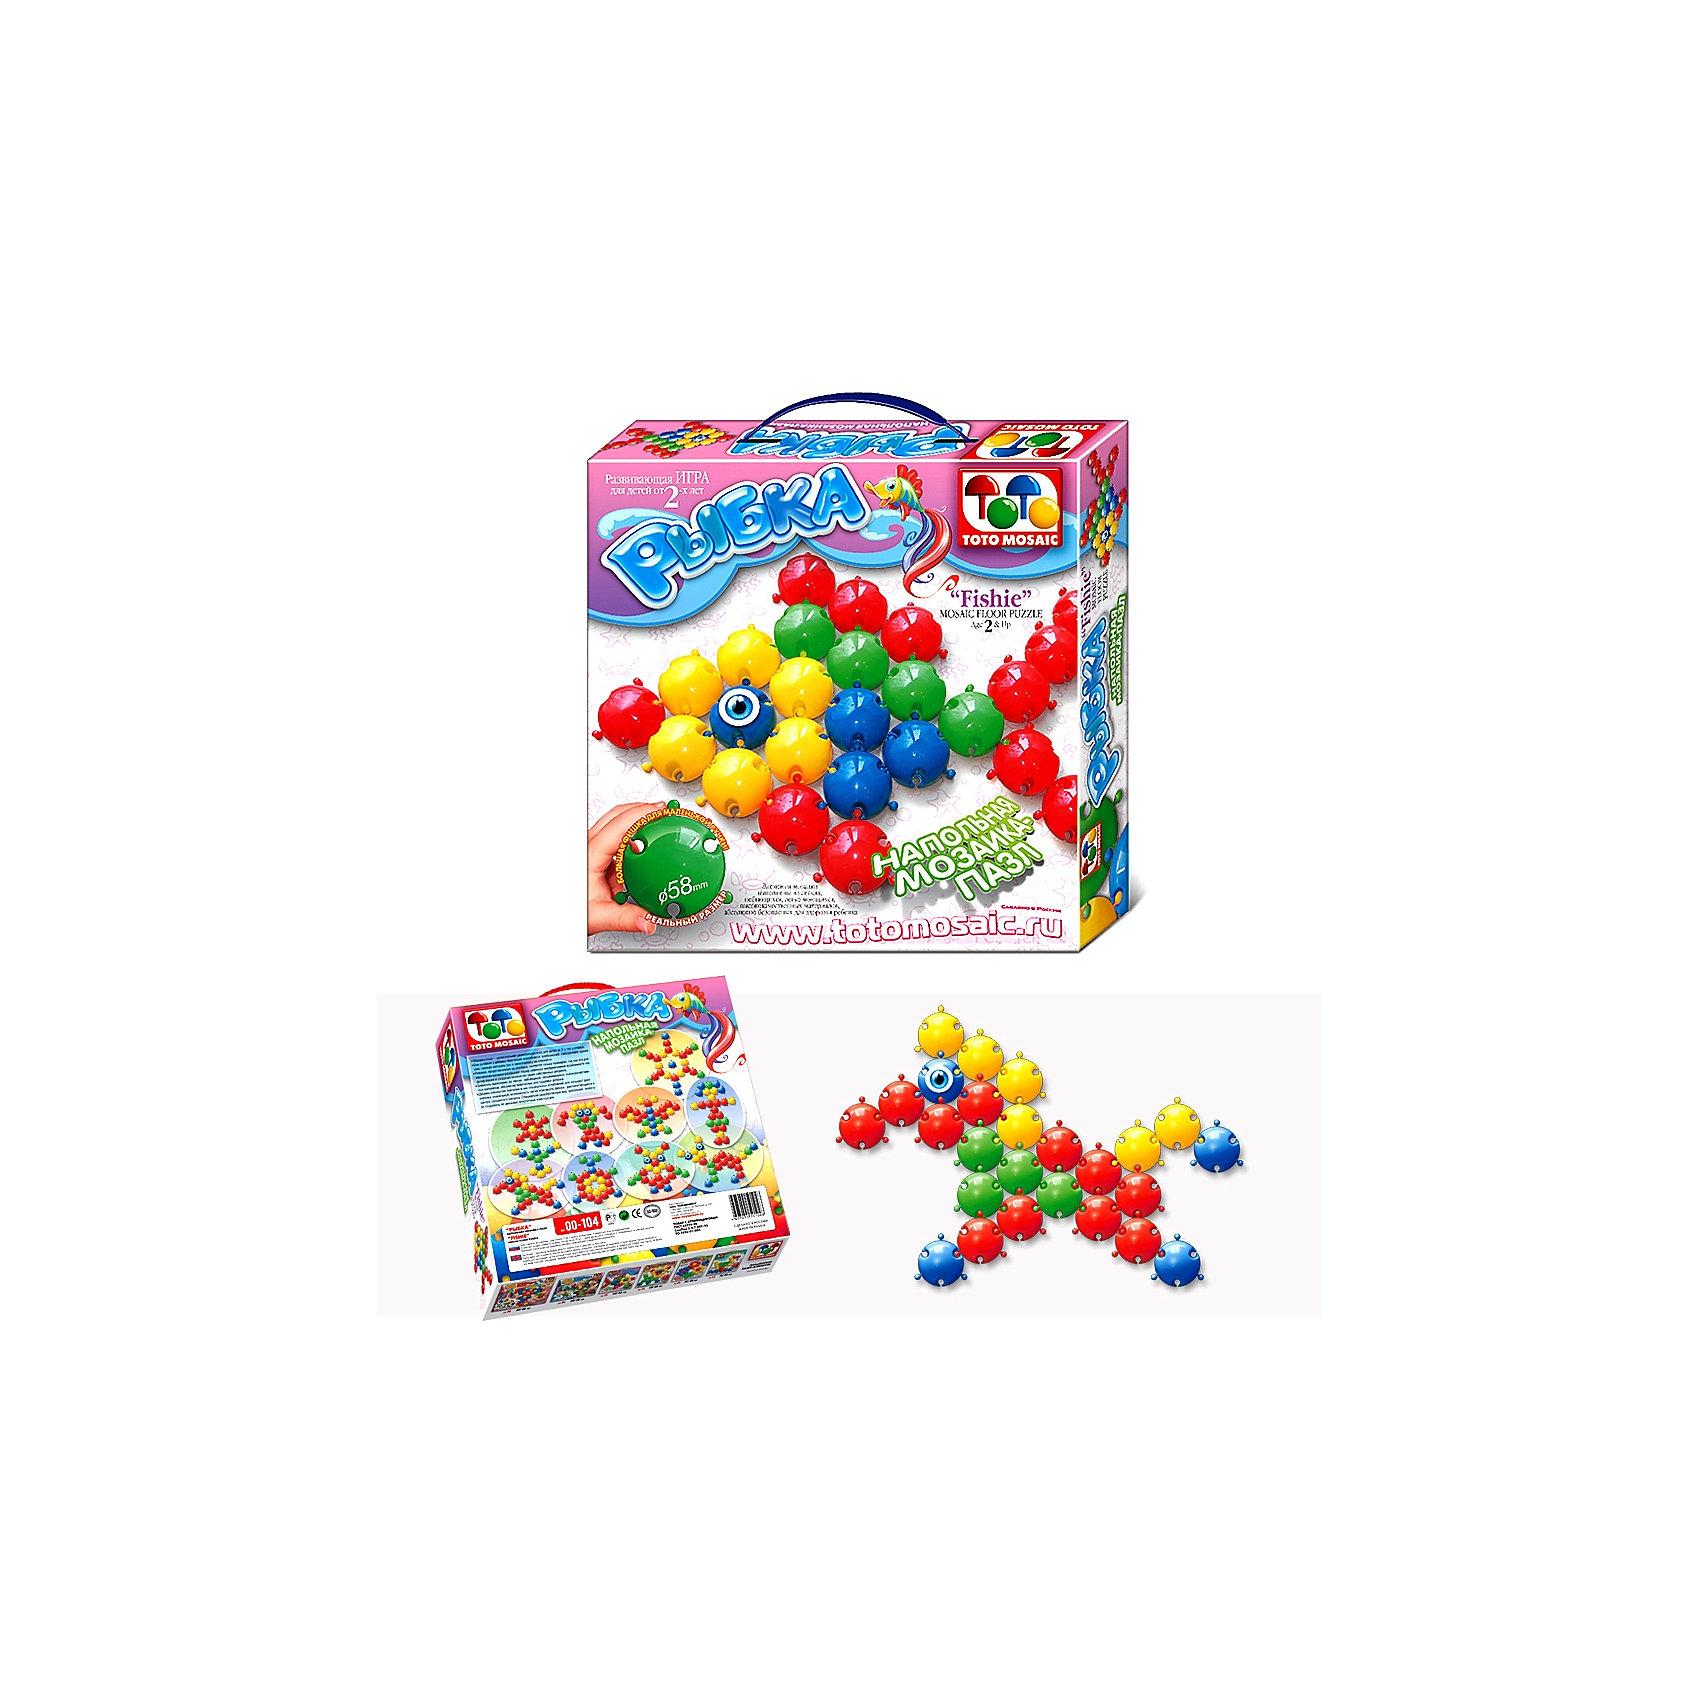 Toys Union Напольная мозаика Рыбка, 25 деталей, д. 58 мм, Toys Union toys union напольная мозаика рыбка 25 деталей д 58 мм toys union